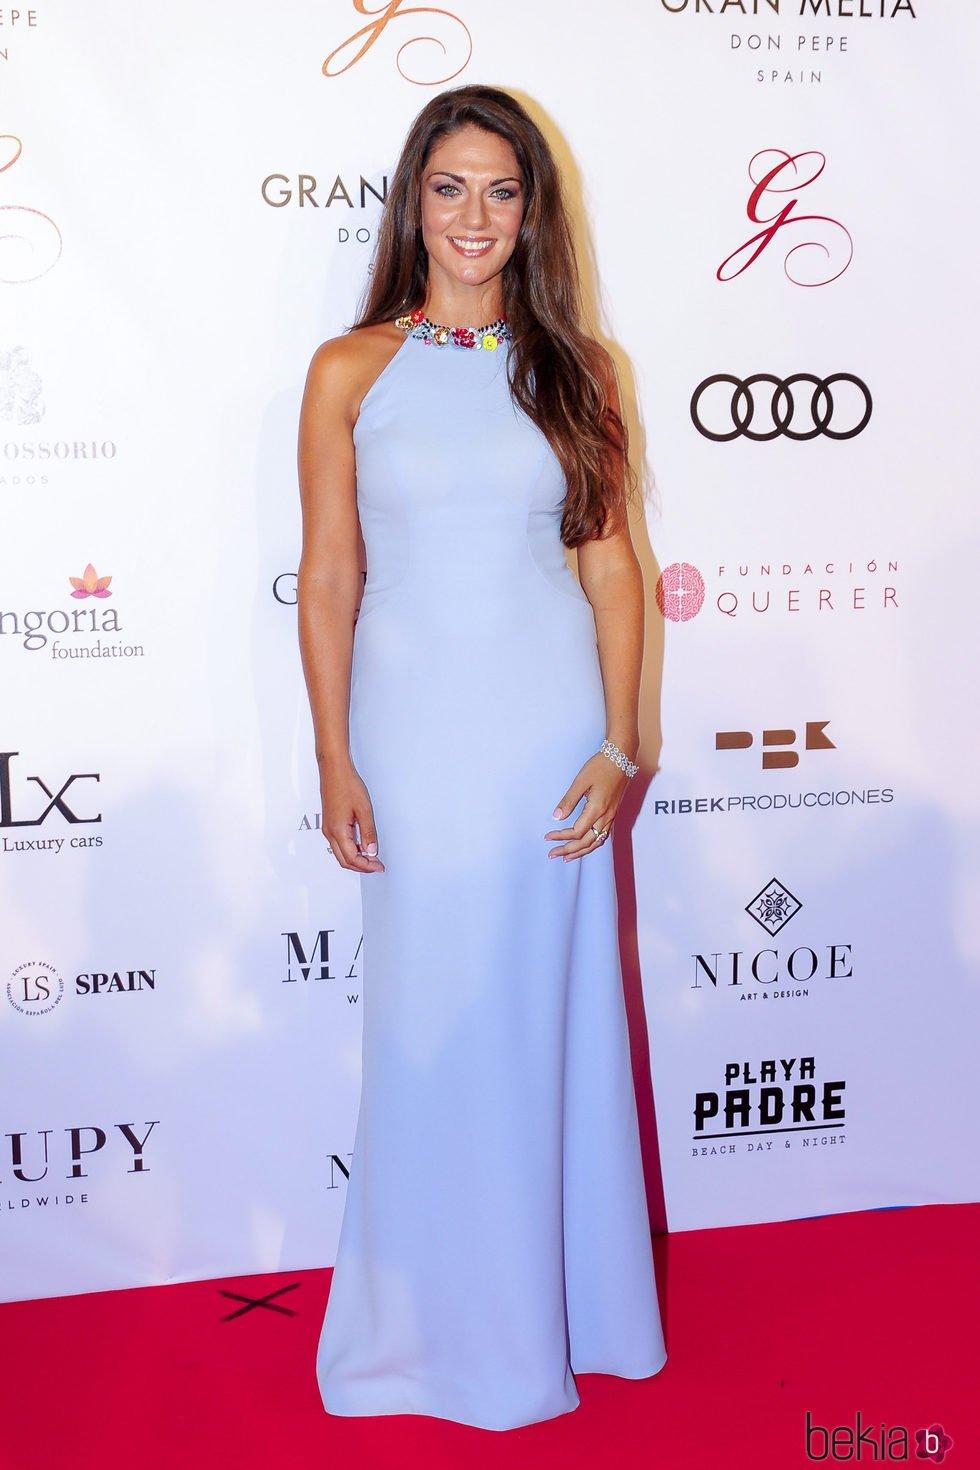 Lorena Bernal en la gala Global Gift de Marbella 2017